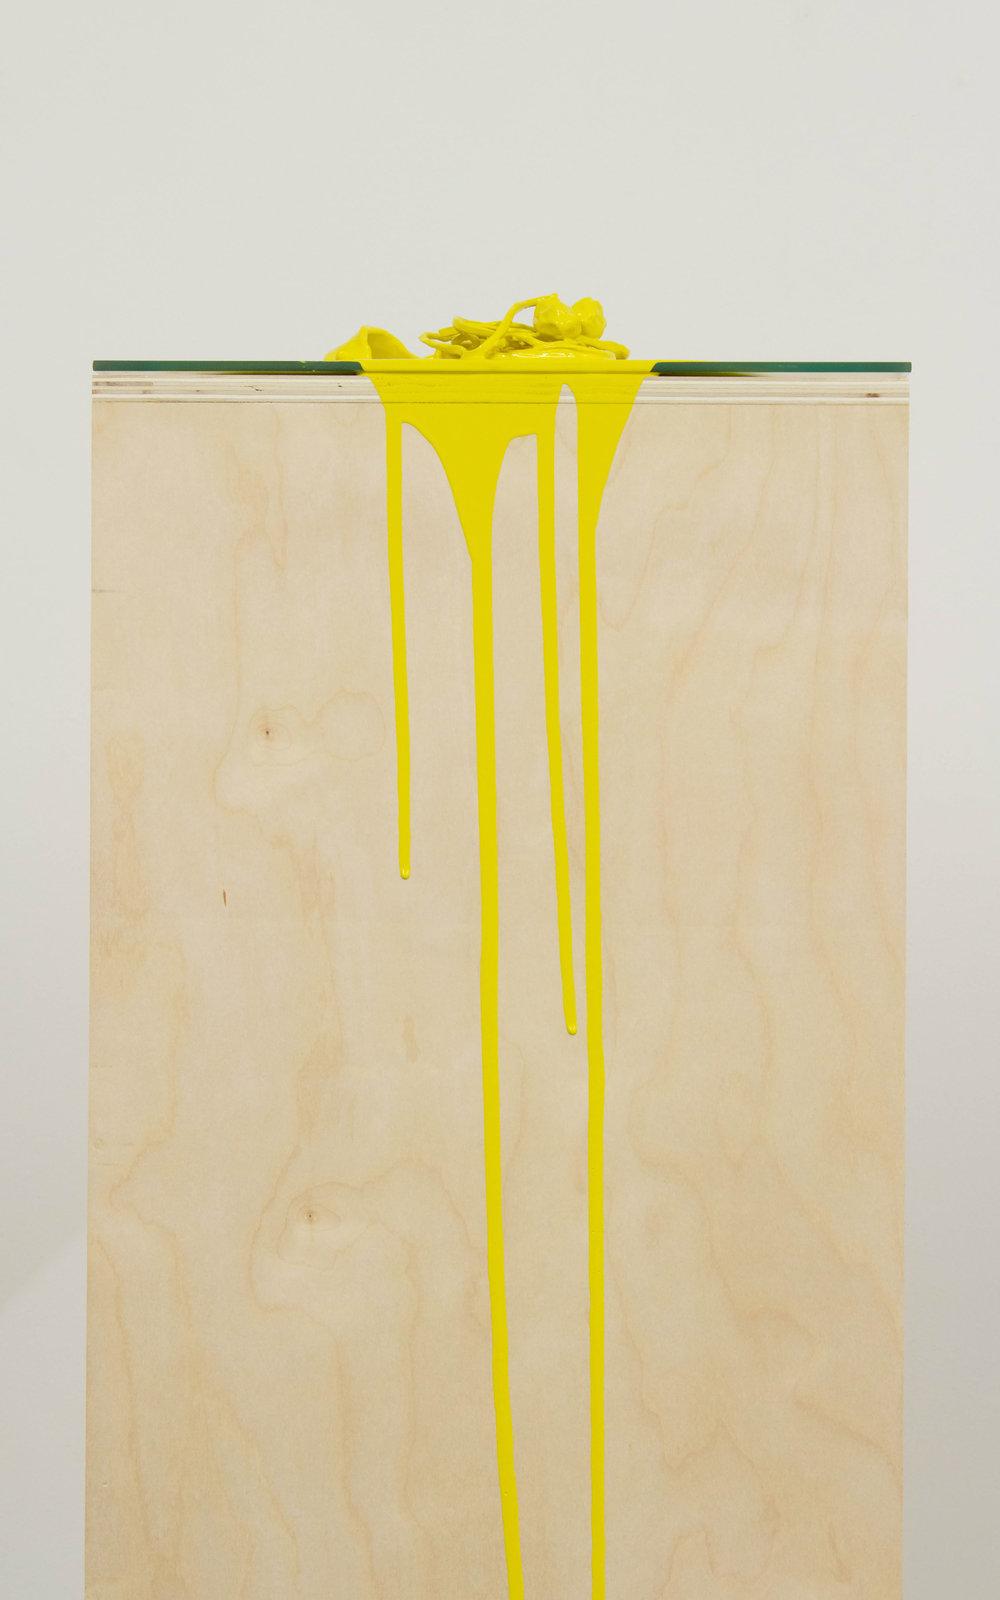 Untitled  (that's not pee)   (detail)  Baltic birch, glass, porcelain, enamel paint  2017